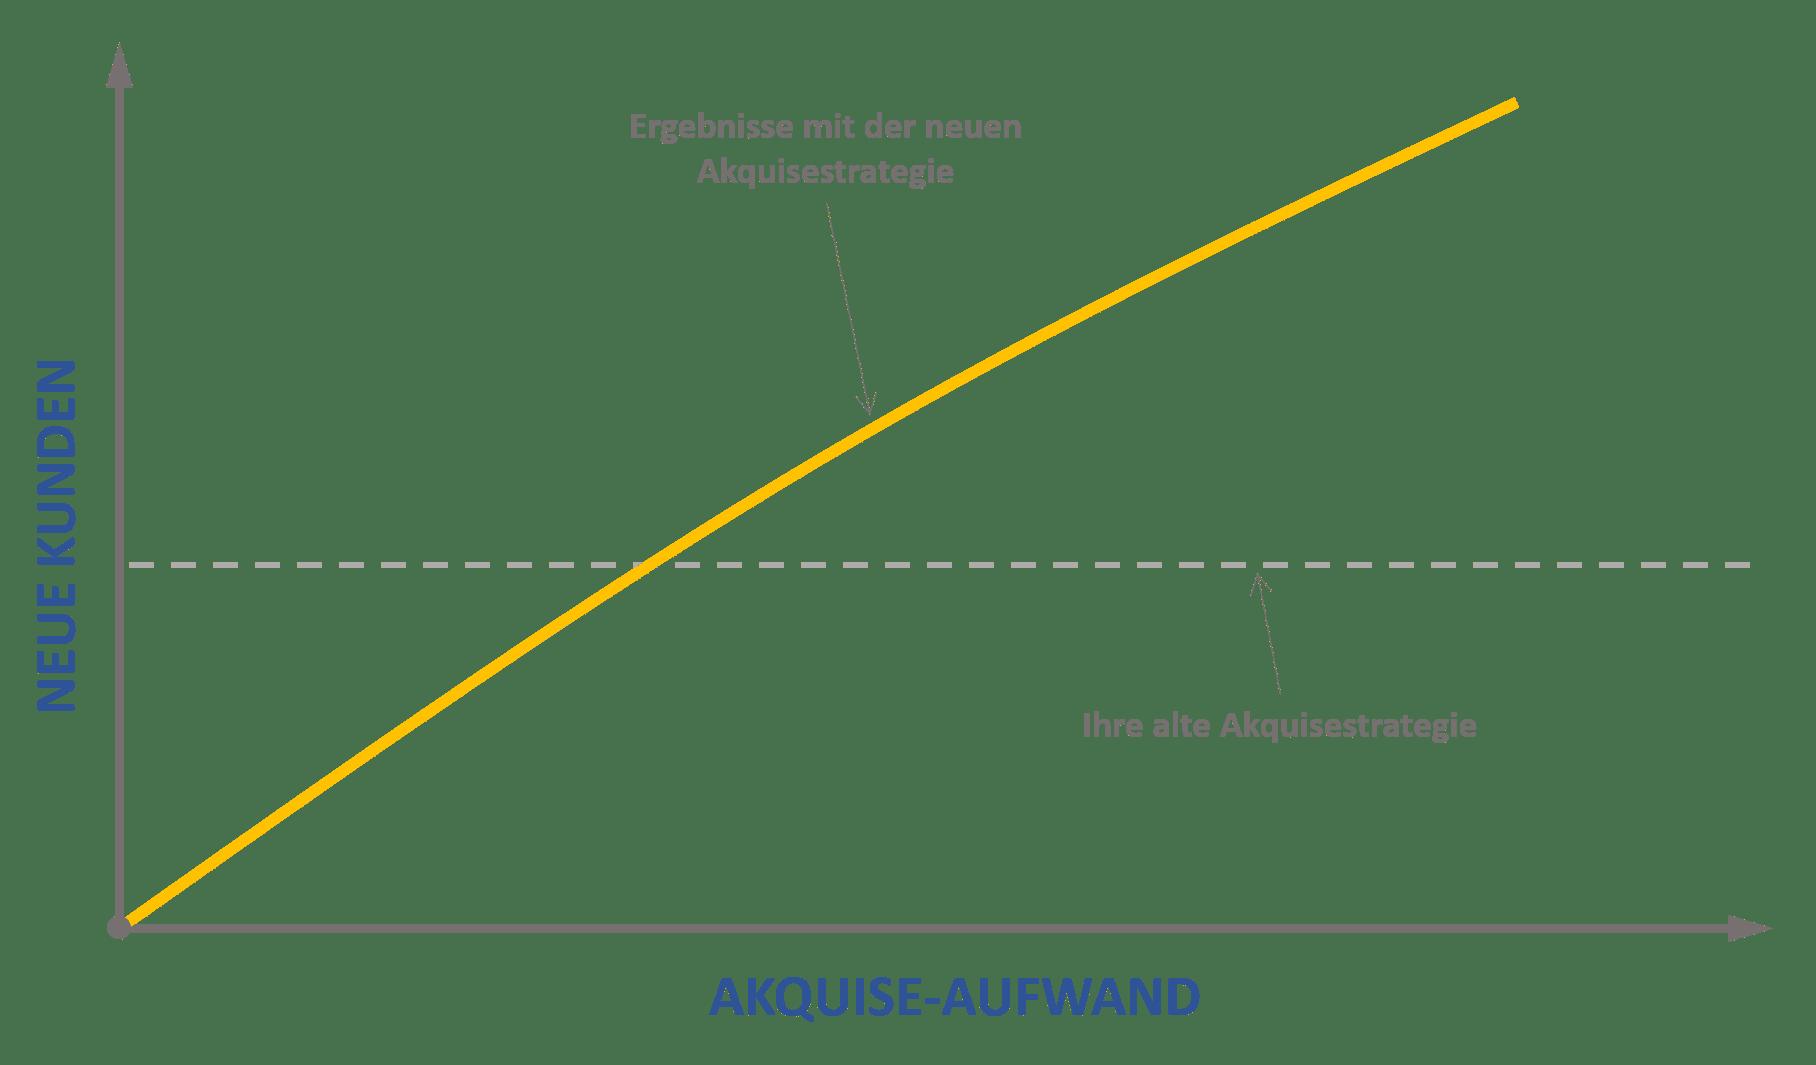 akquisestrategie-kunden-neu